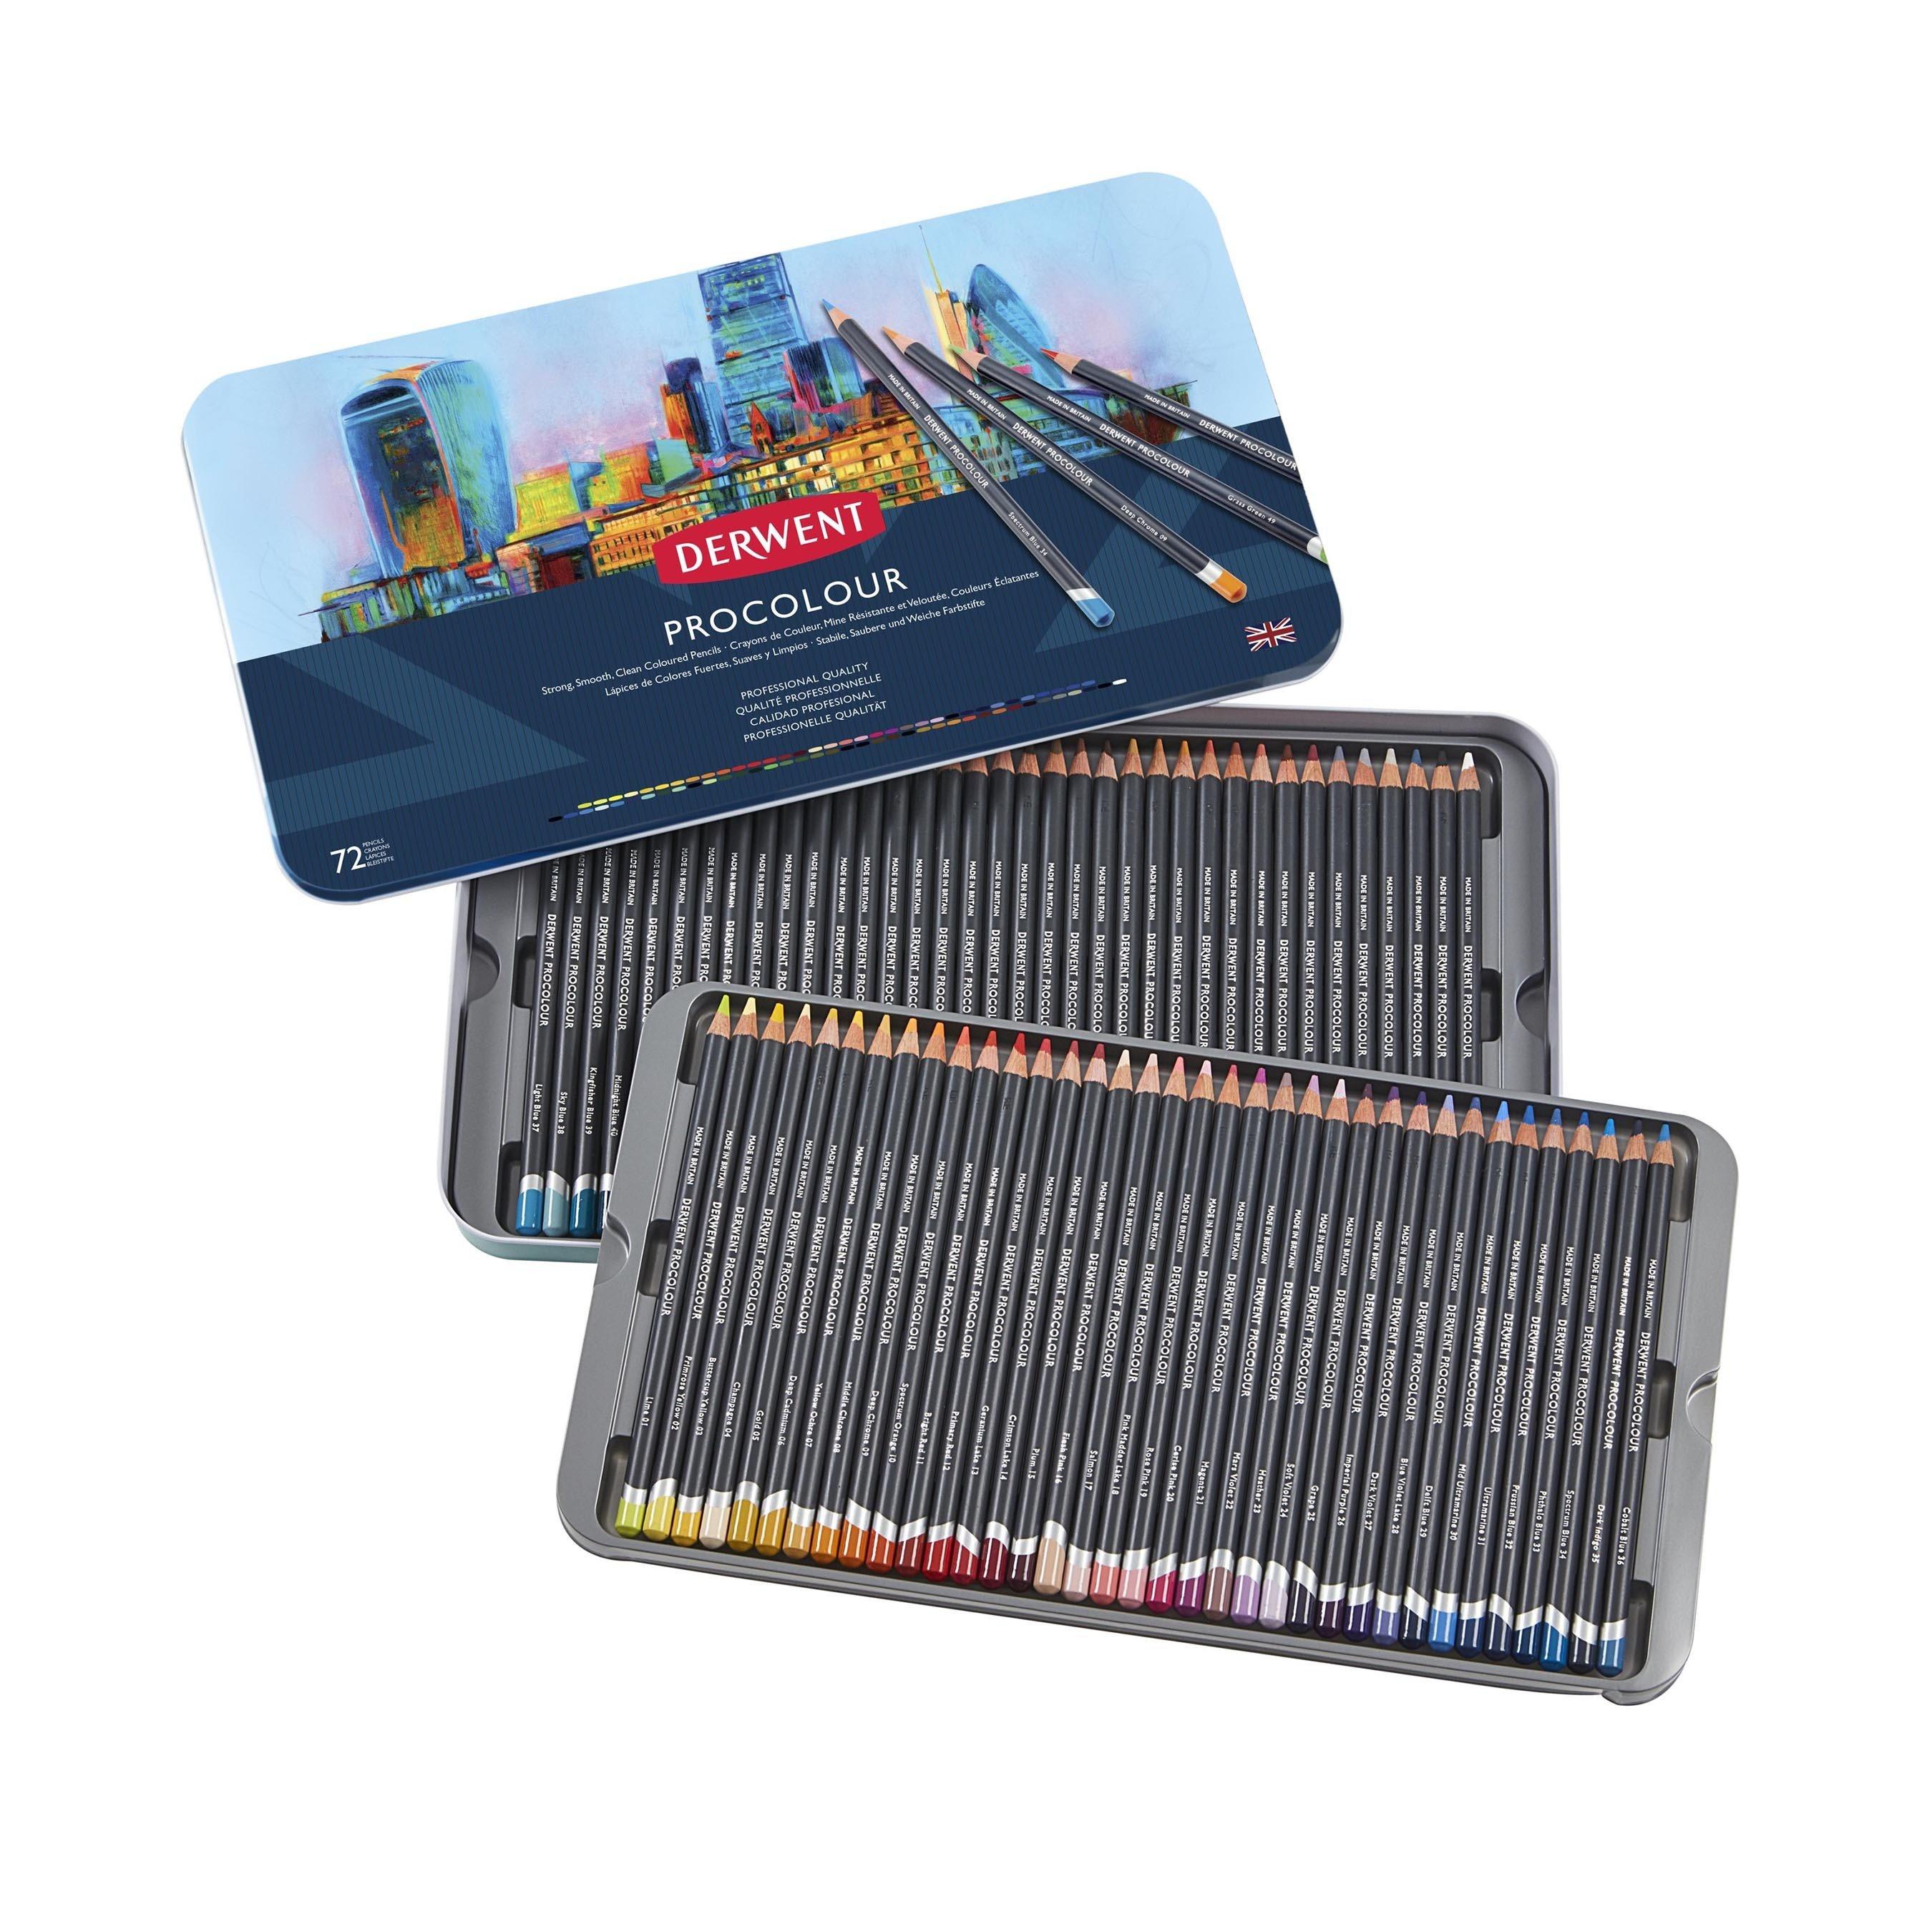 Derwent - Procolour Pencils, 72 Tin